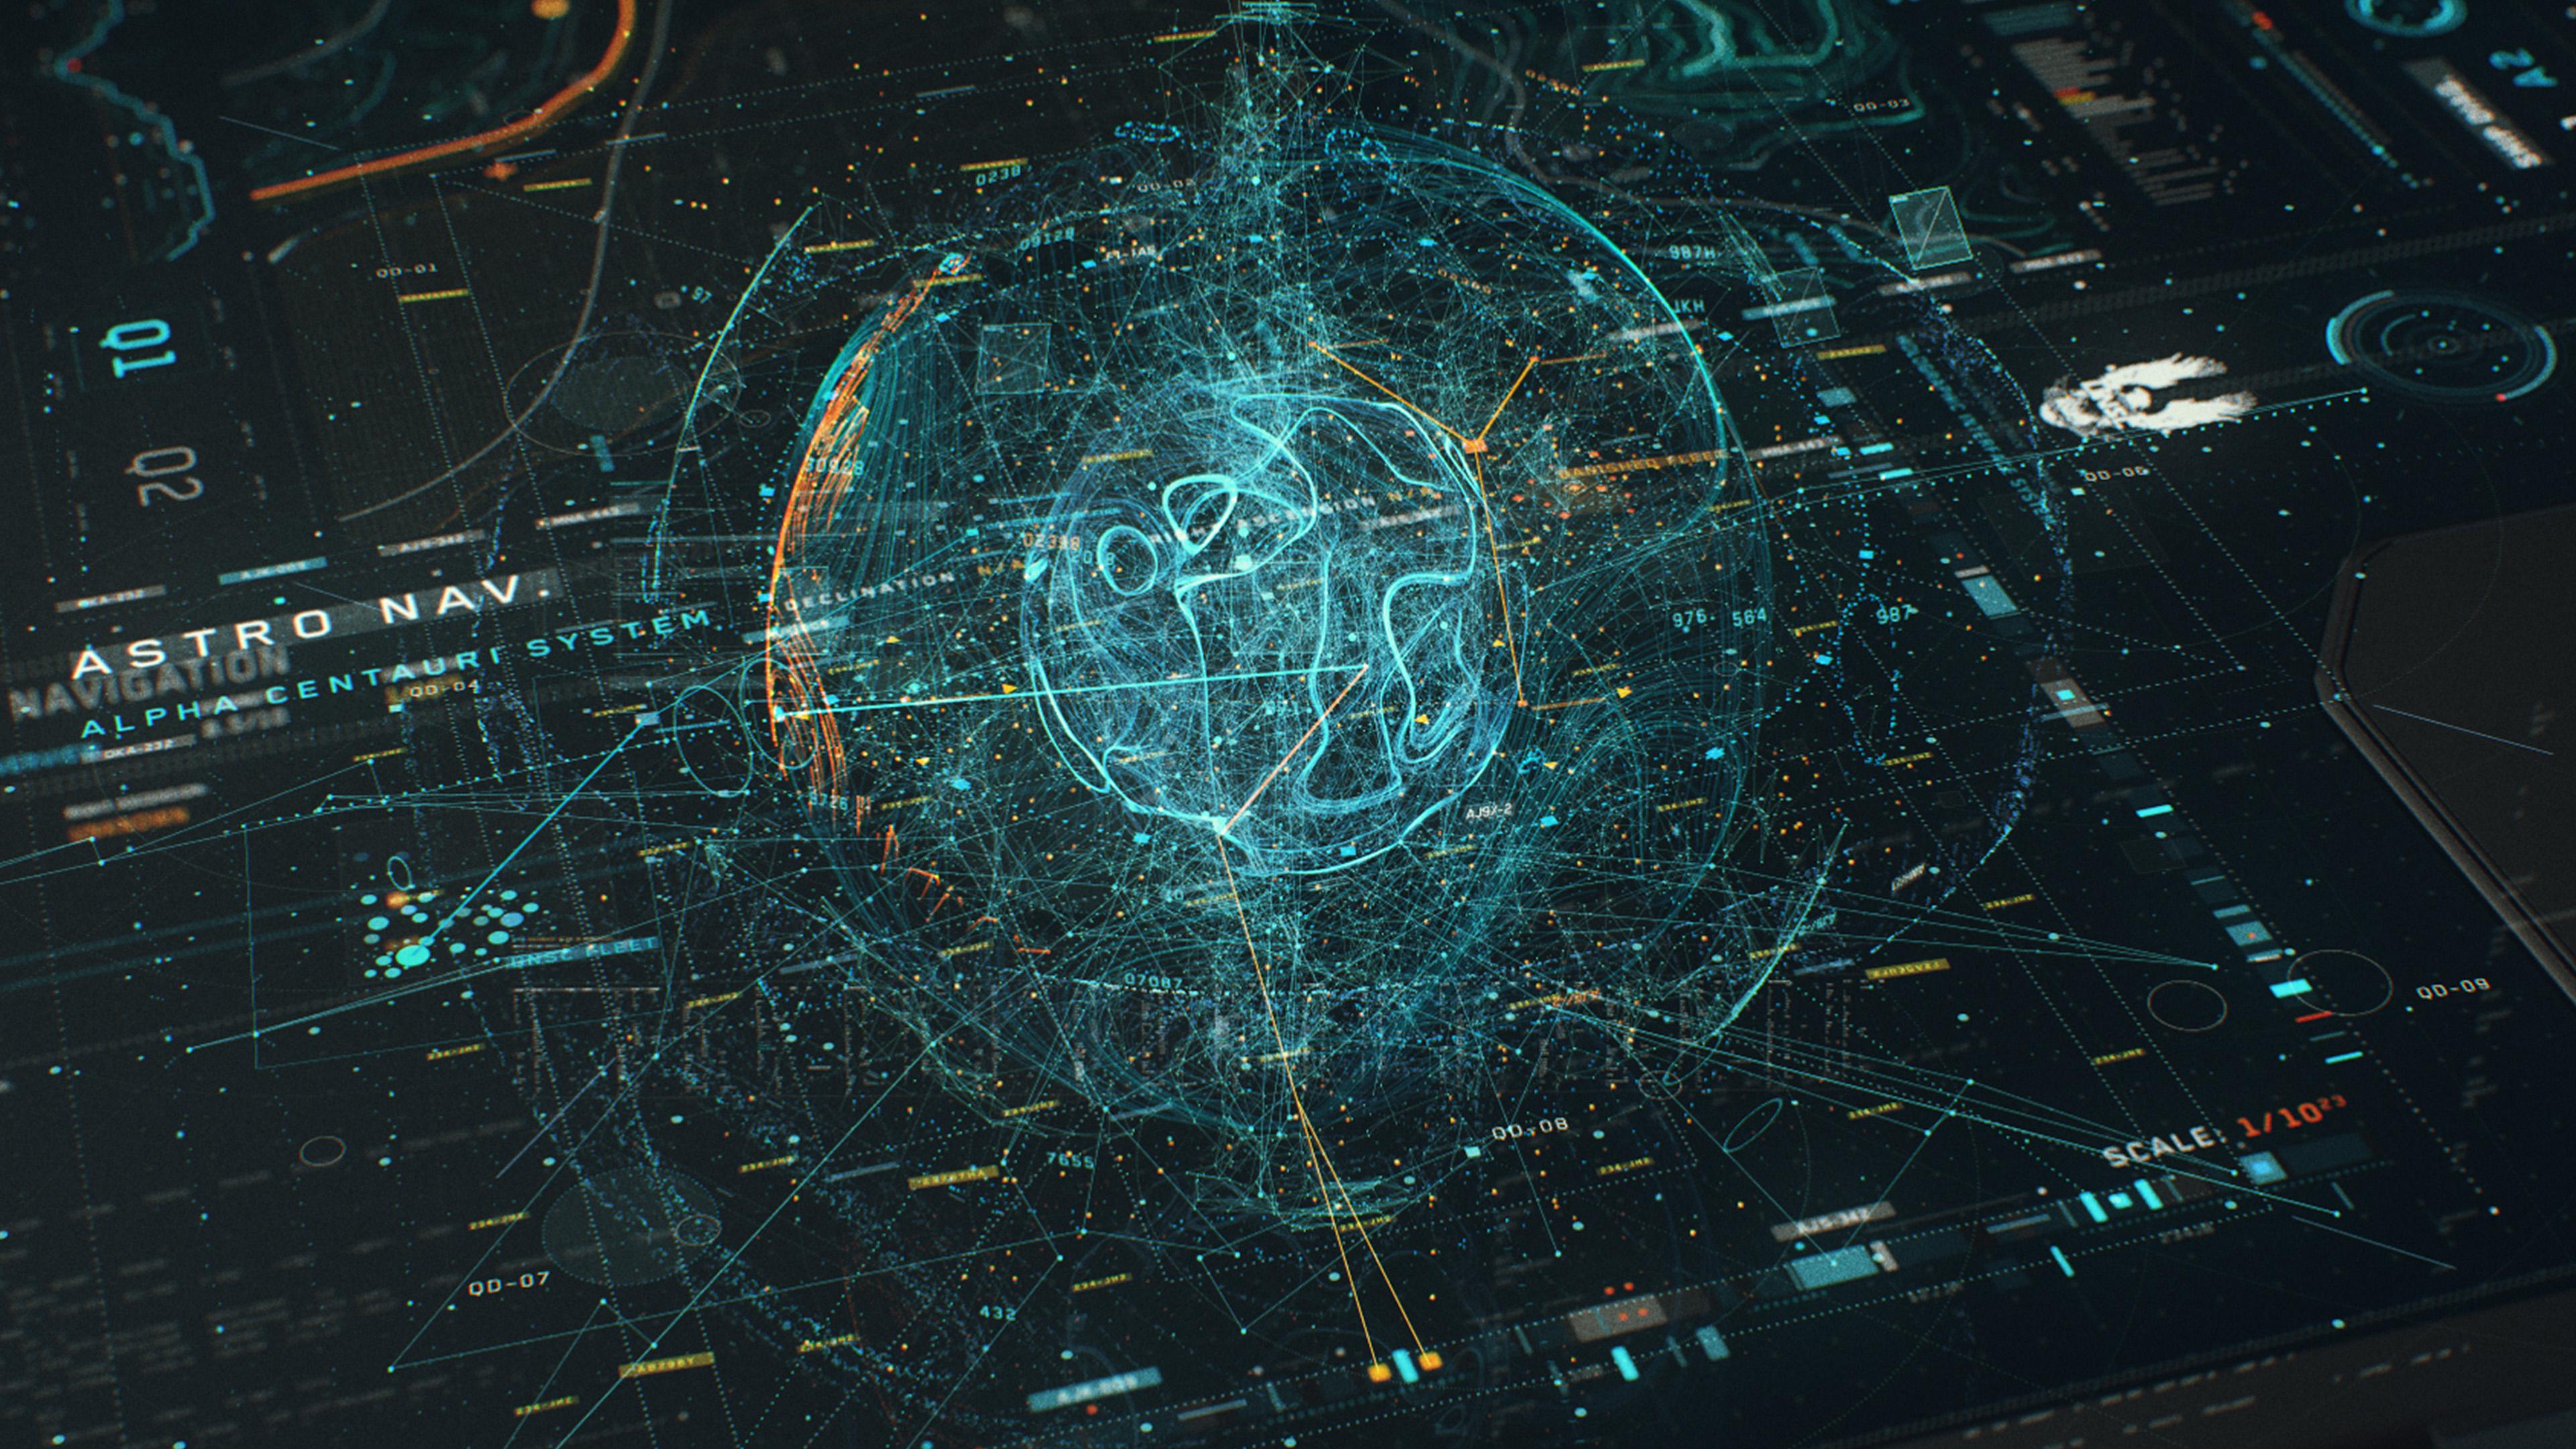 Red Star 3d Wallpaper Wallpaper For Desktop Laptop Vy60 Digital Blue Line